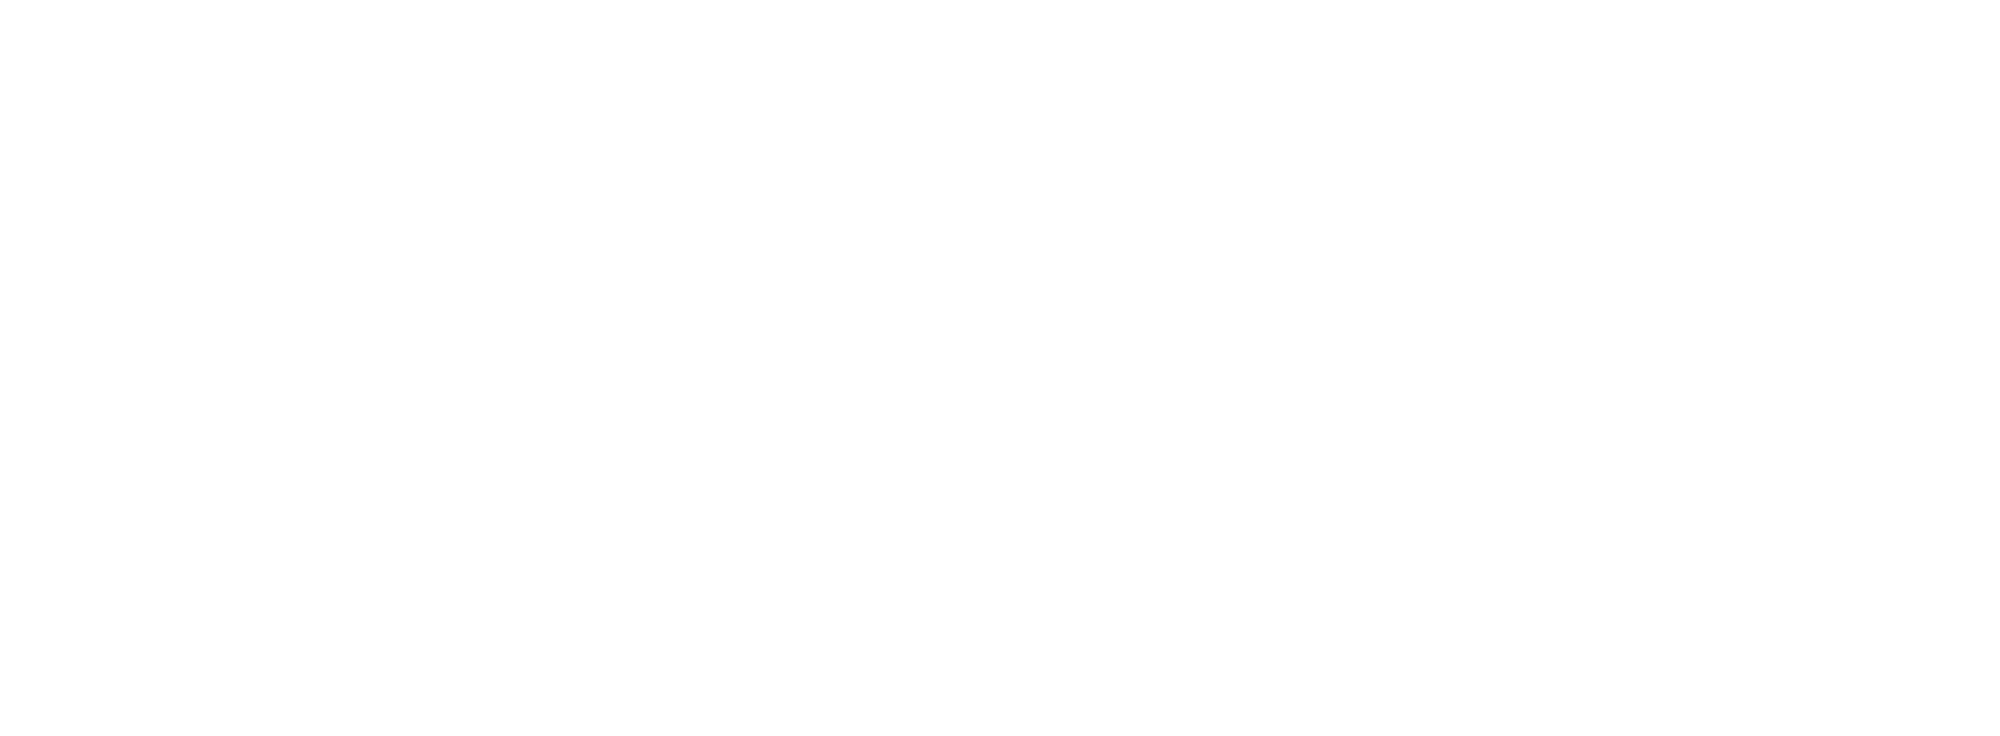 Wey Engineering | Conceptual Roadway Design